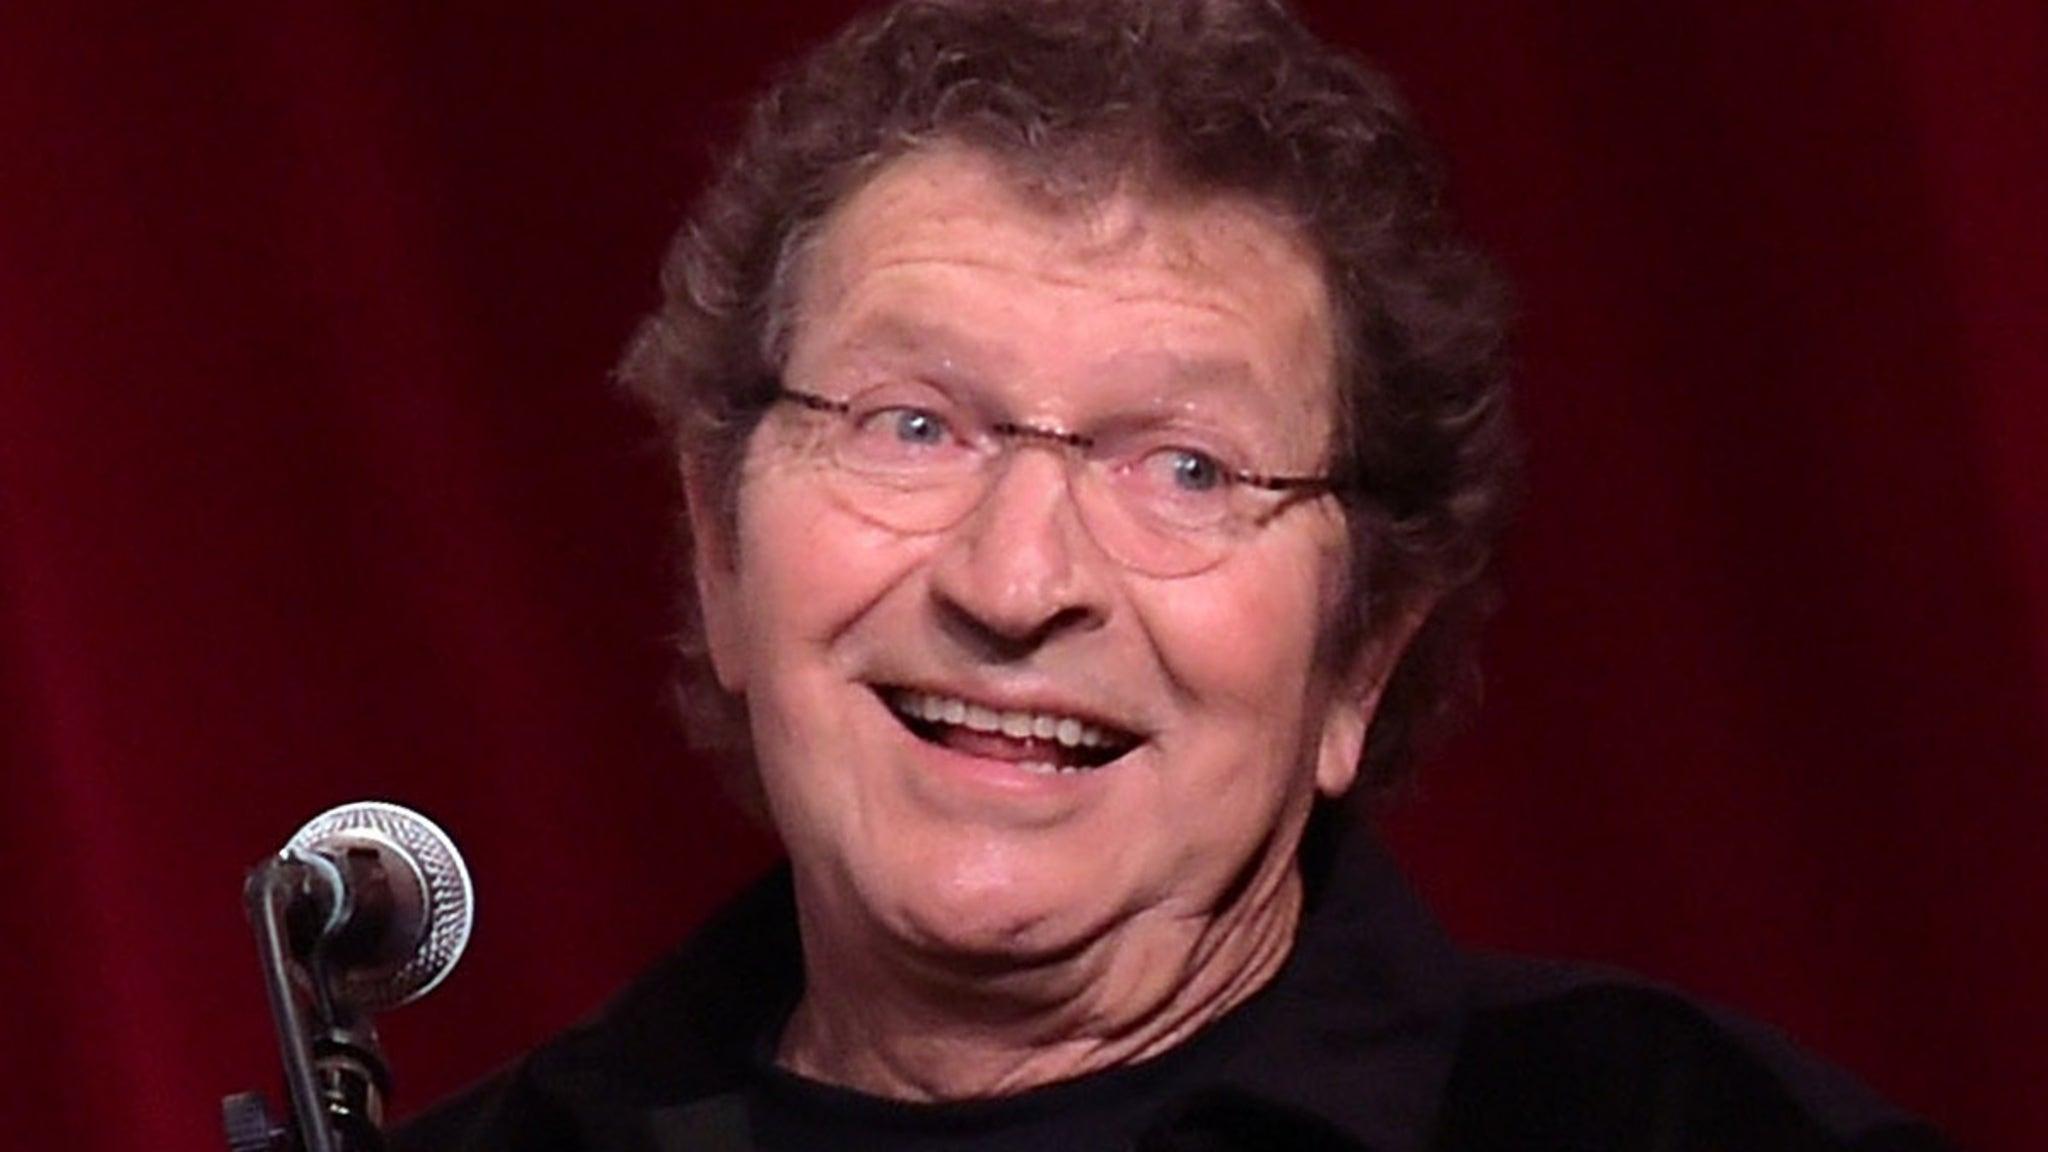 Mac Davis Country Music Star Dead at 78 ... Following Heart Surgery